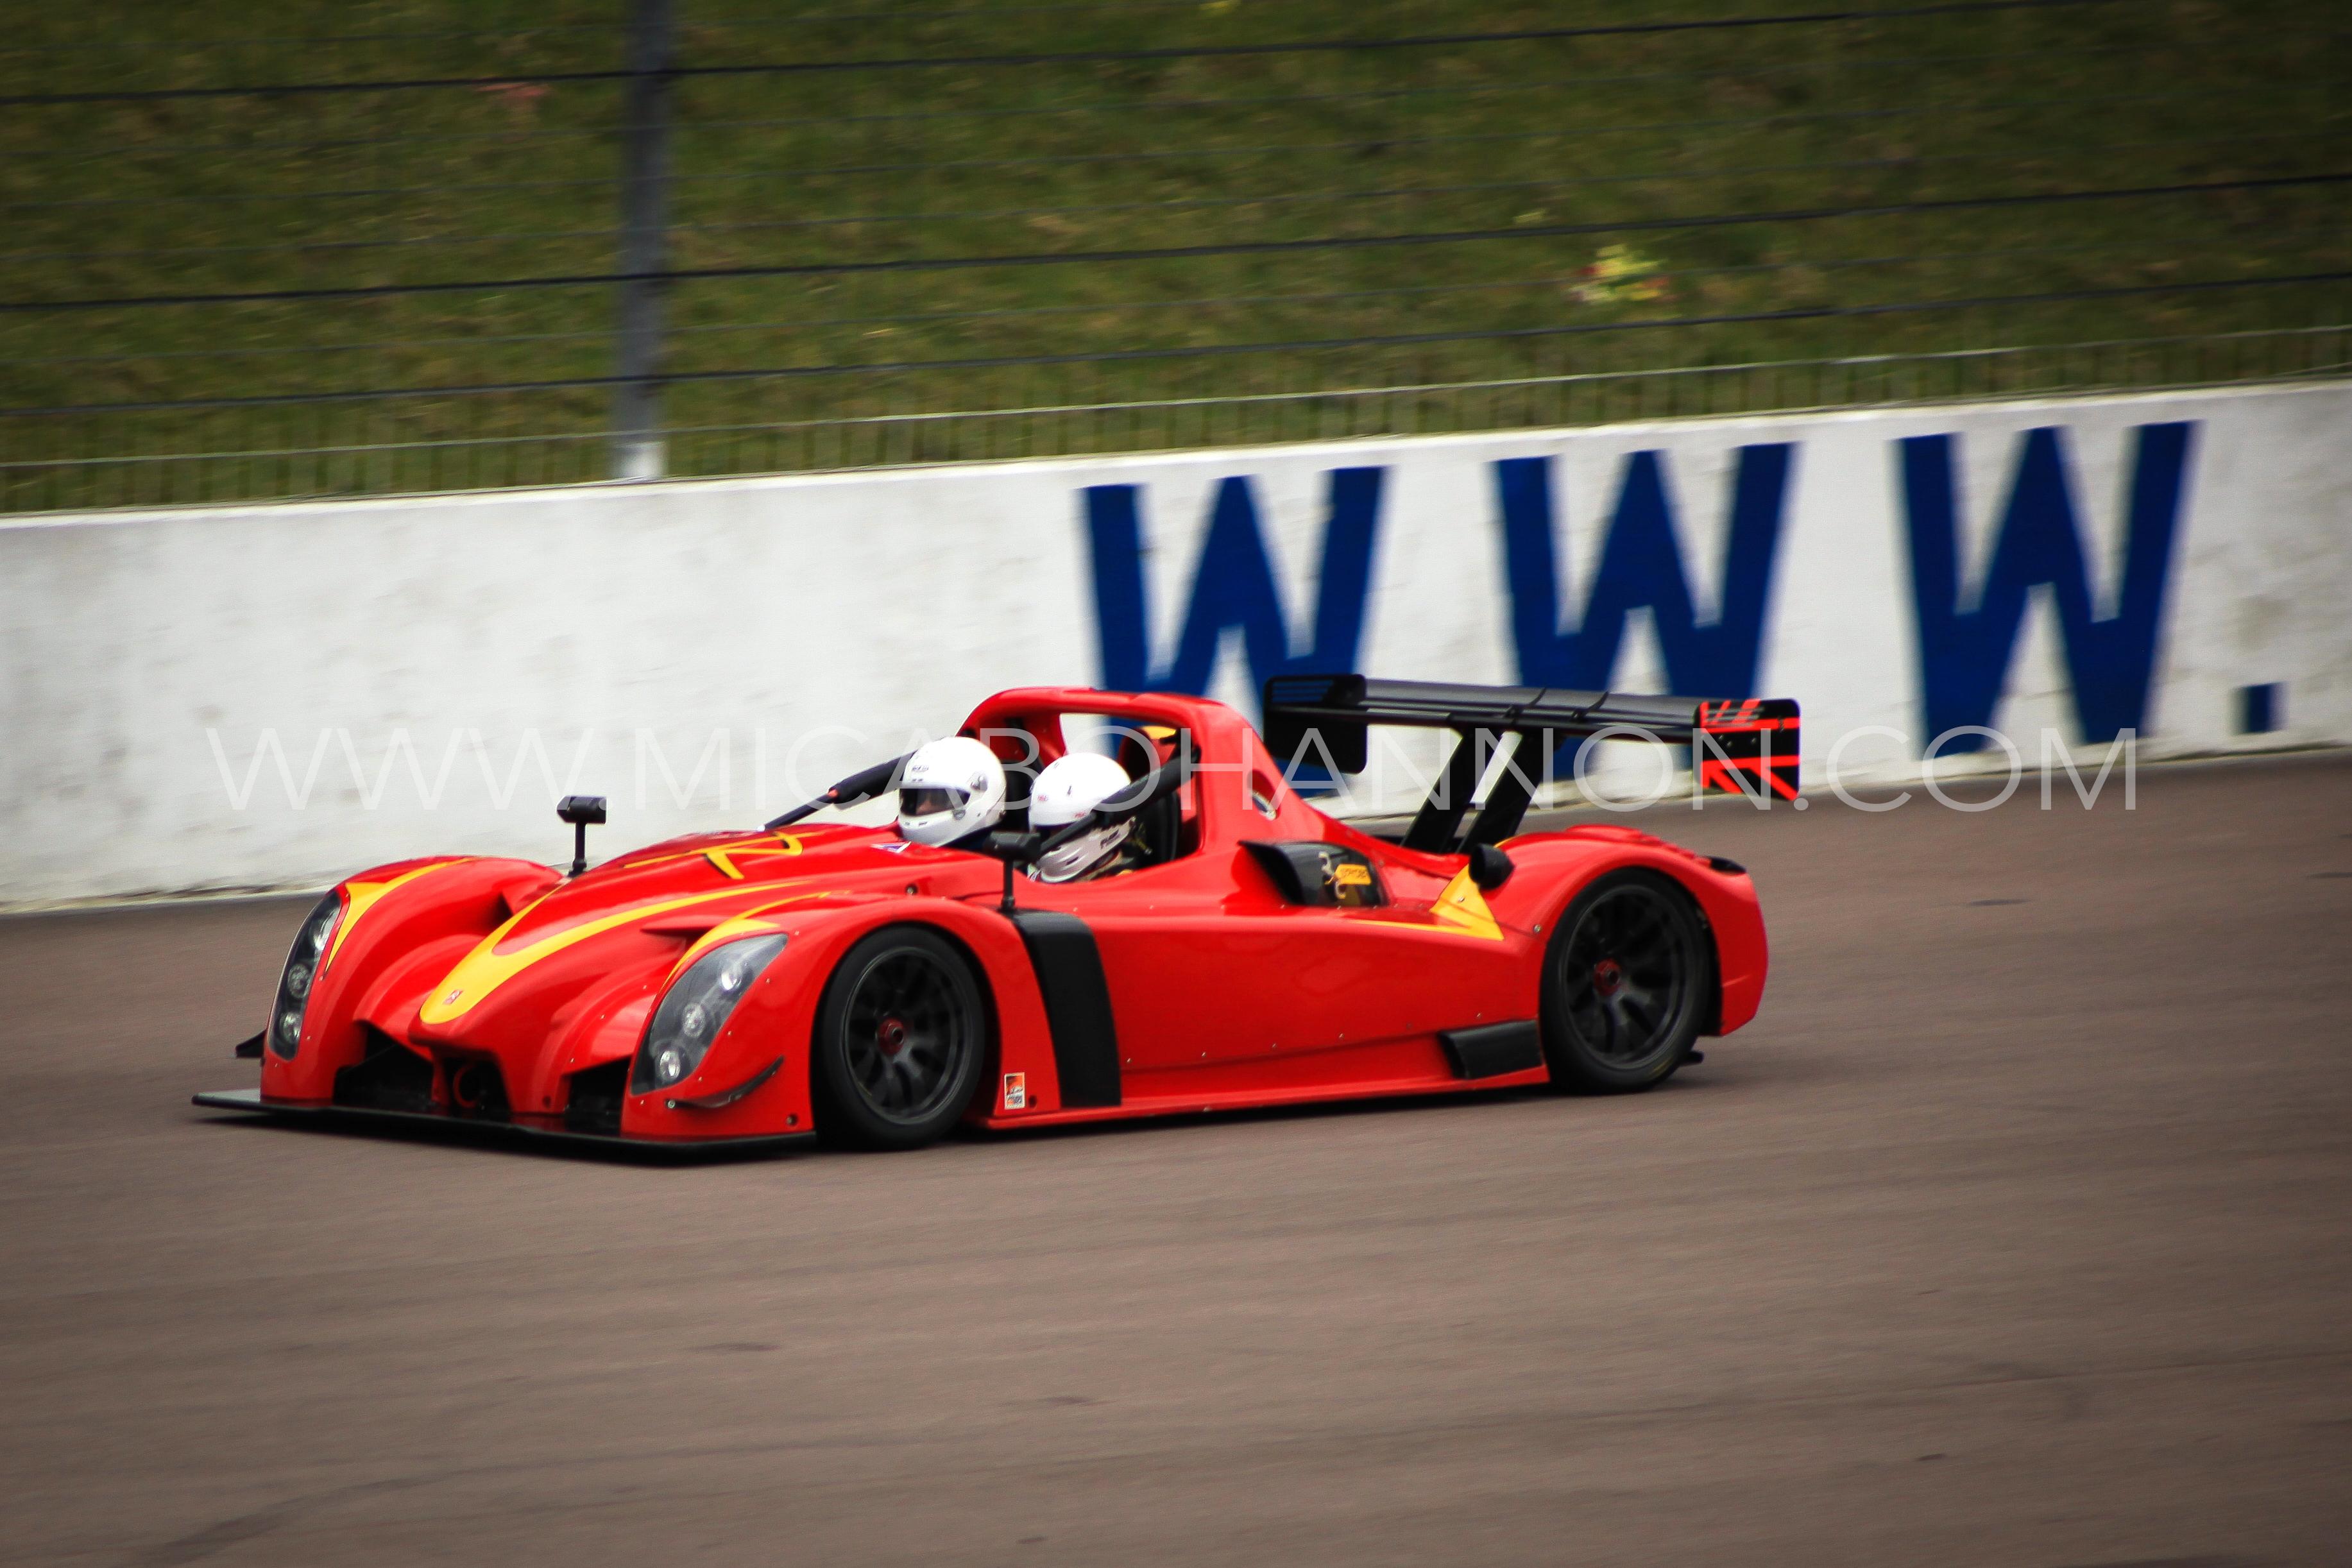 red radical racing